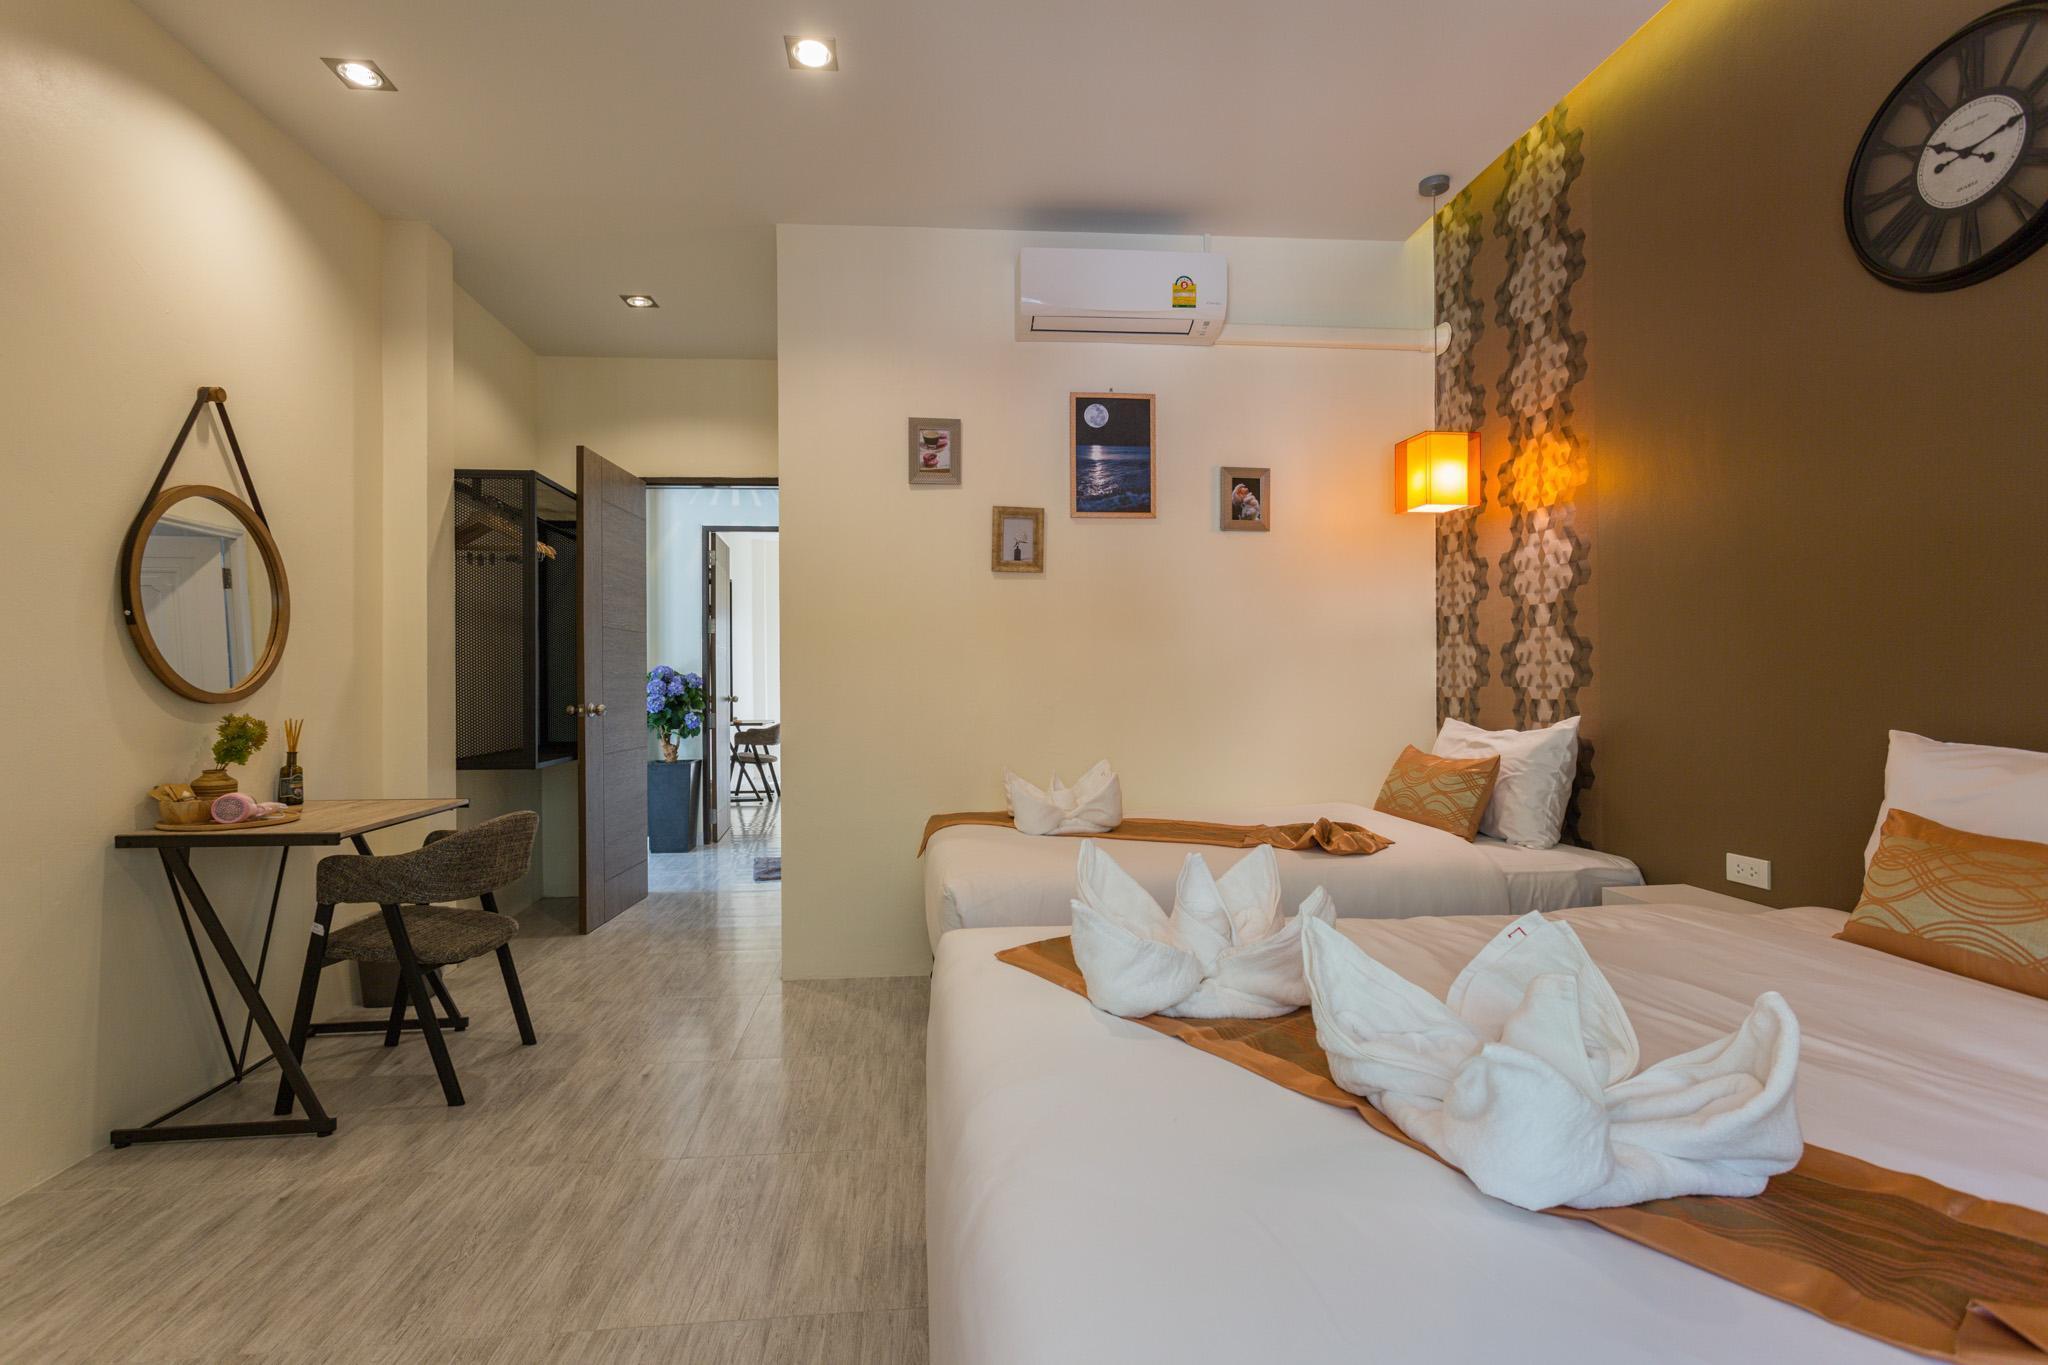 The Peak Pool Villa Aonang วิลลา 3 ห้องนอน 4 ห้องน้ำส่วนตัว ขนาด 381 ตร.ม. – อ่าวนาง